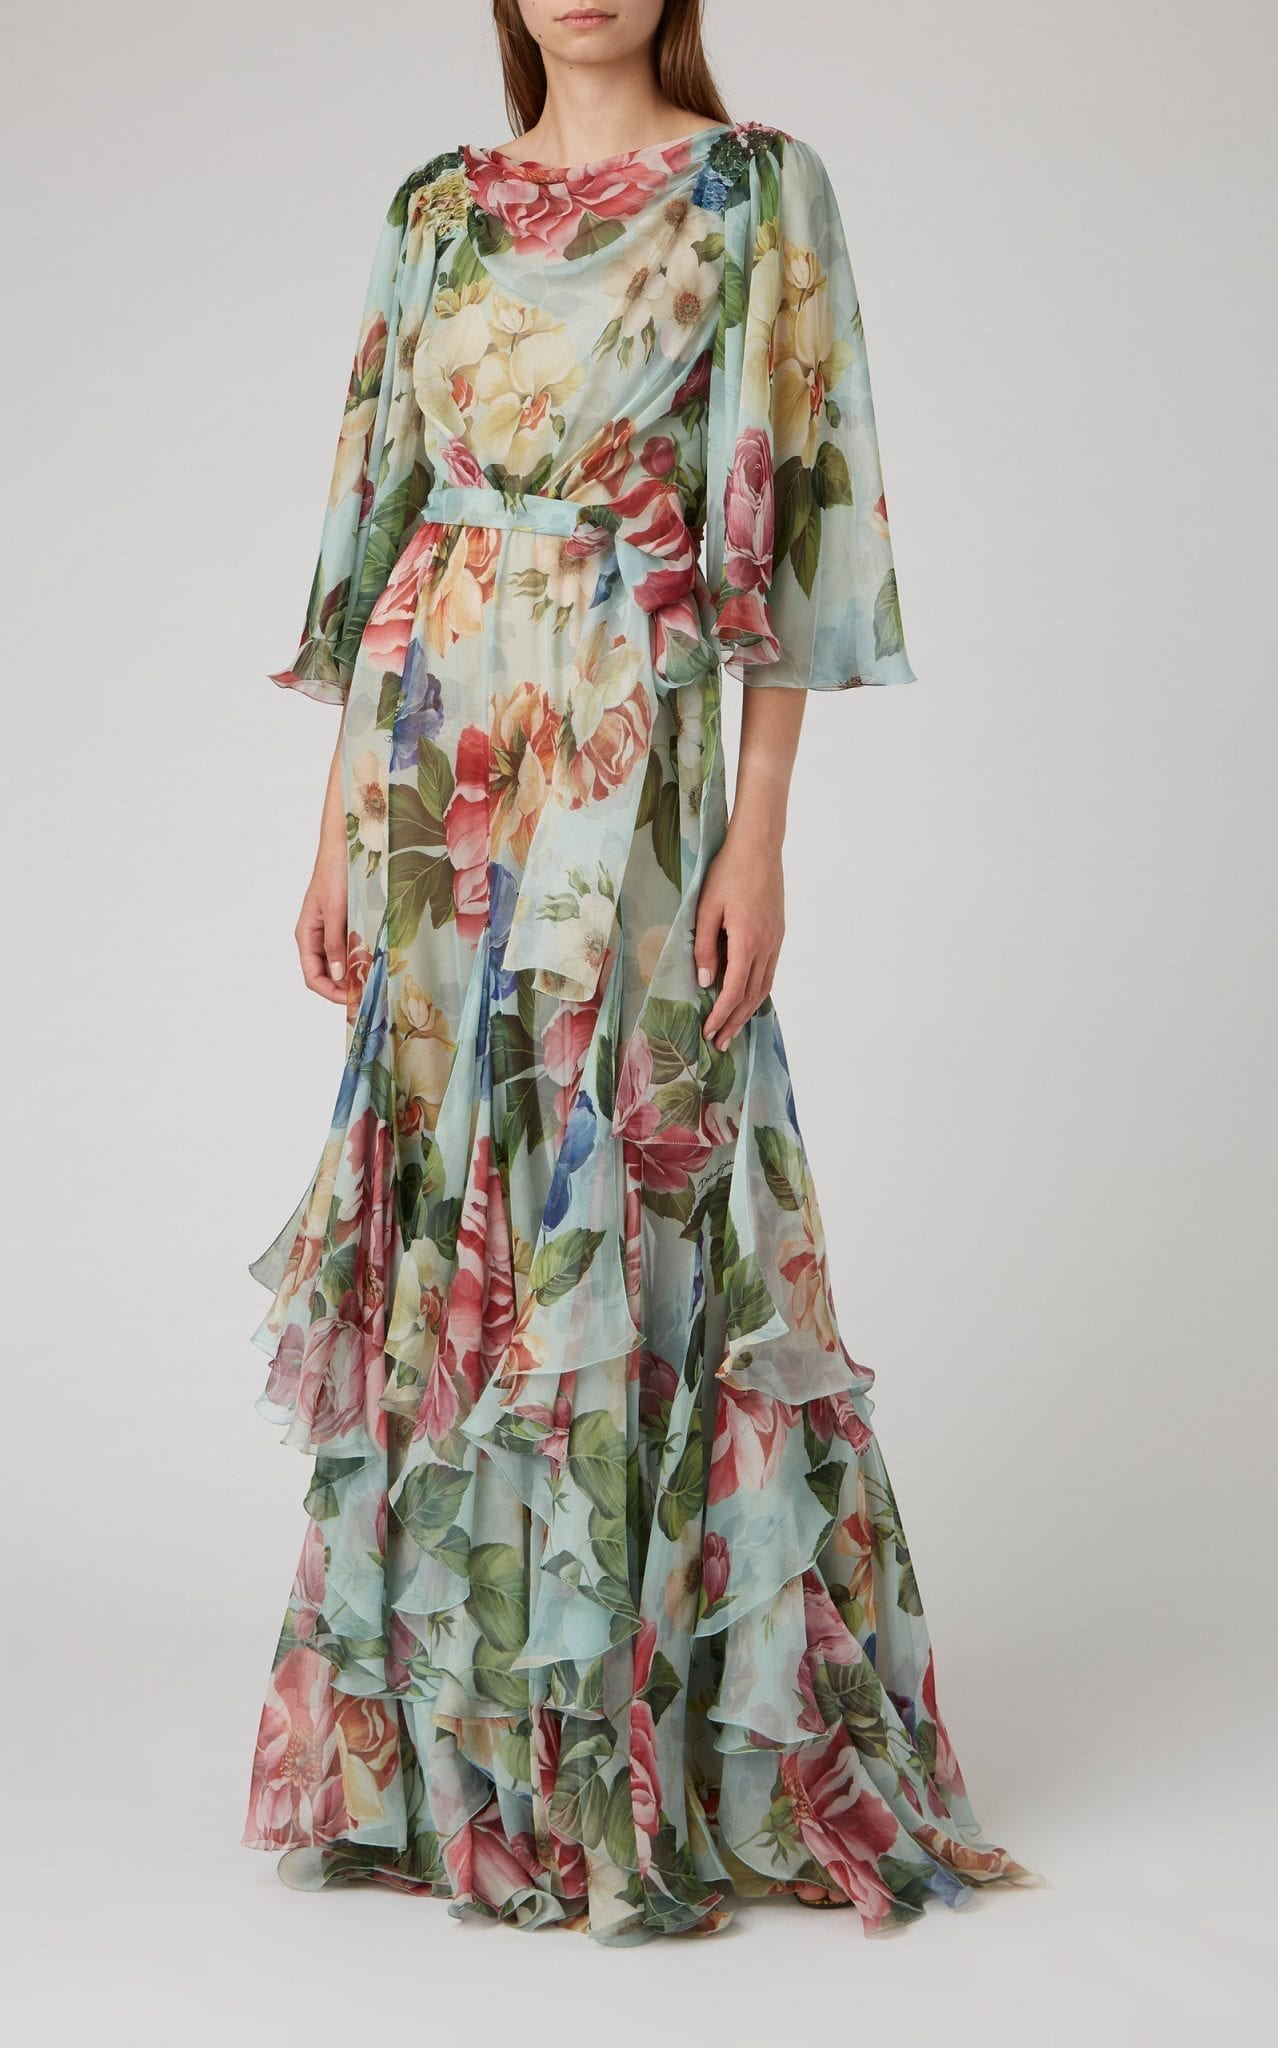 DOLCE & GABBANA Floral-Print Ruffled Silk Gown